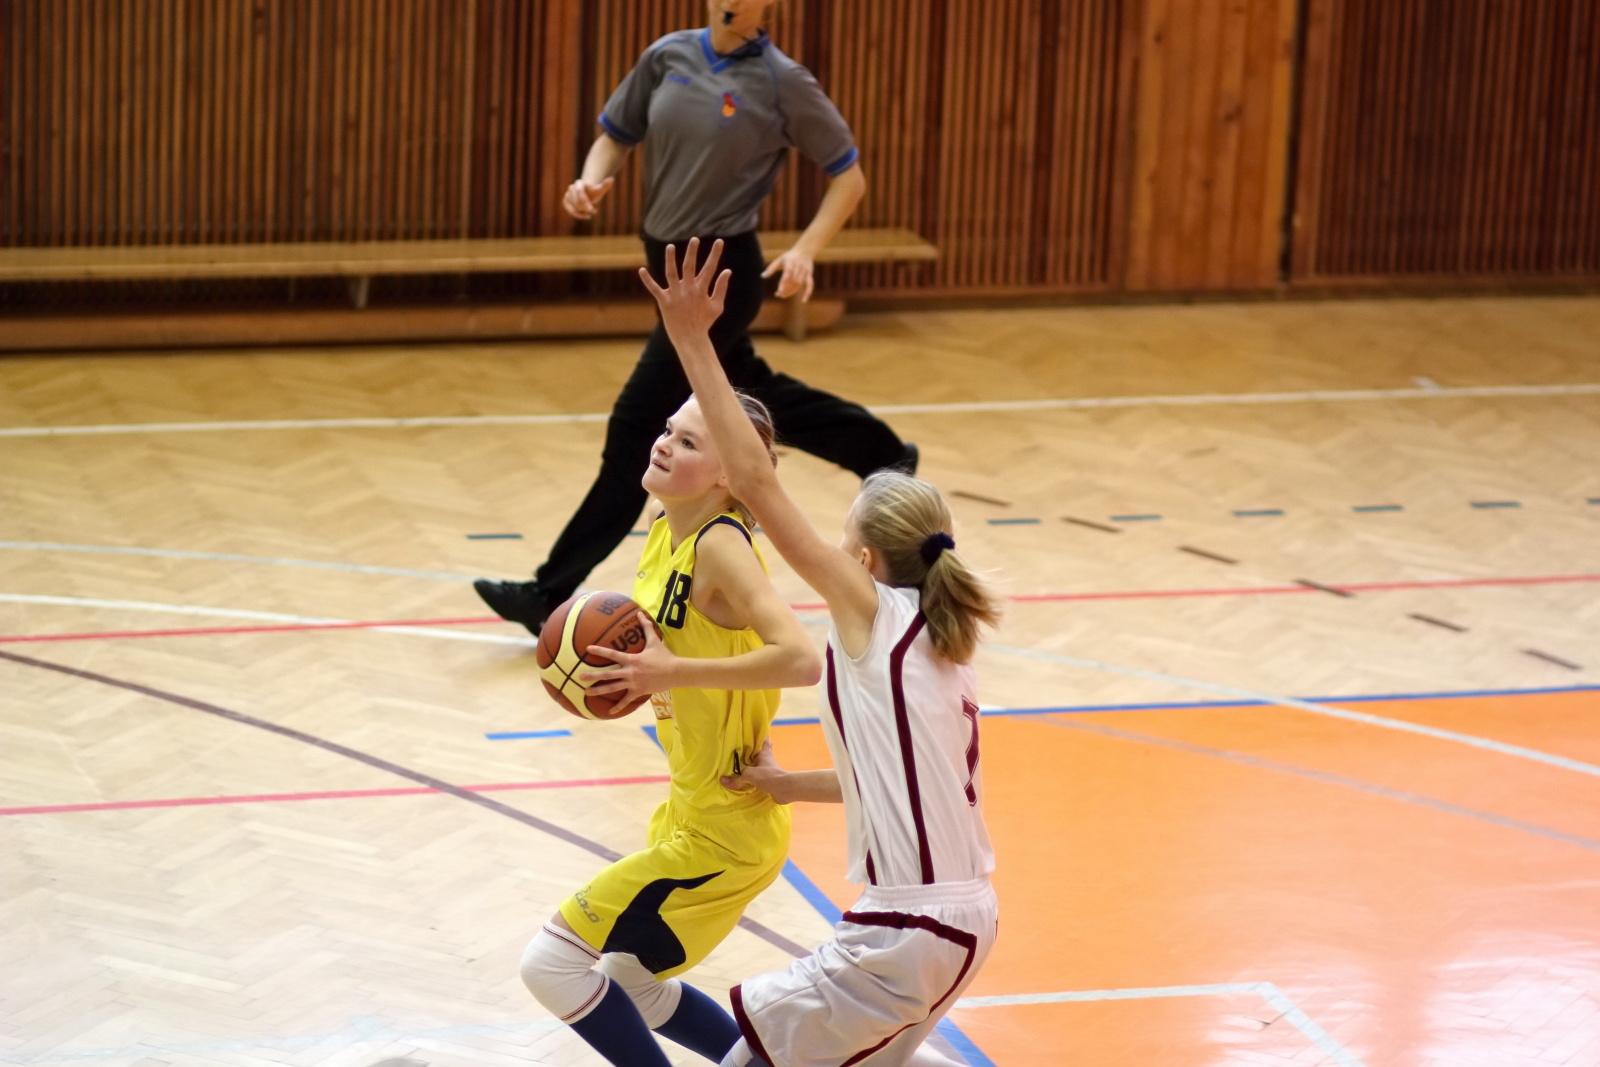 bk-zvolen-tydam-kosice-ziacky-basketbal-2011-9